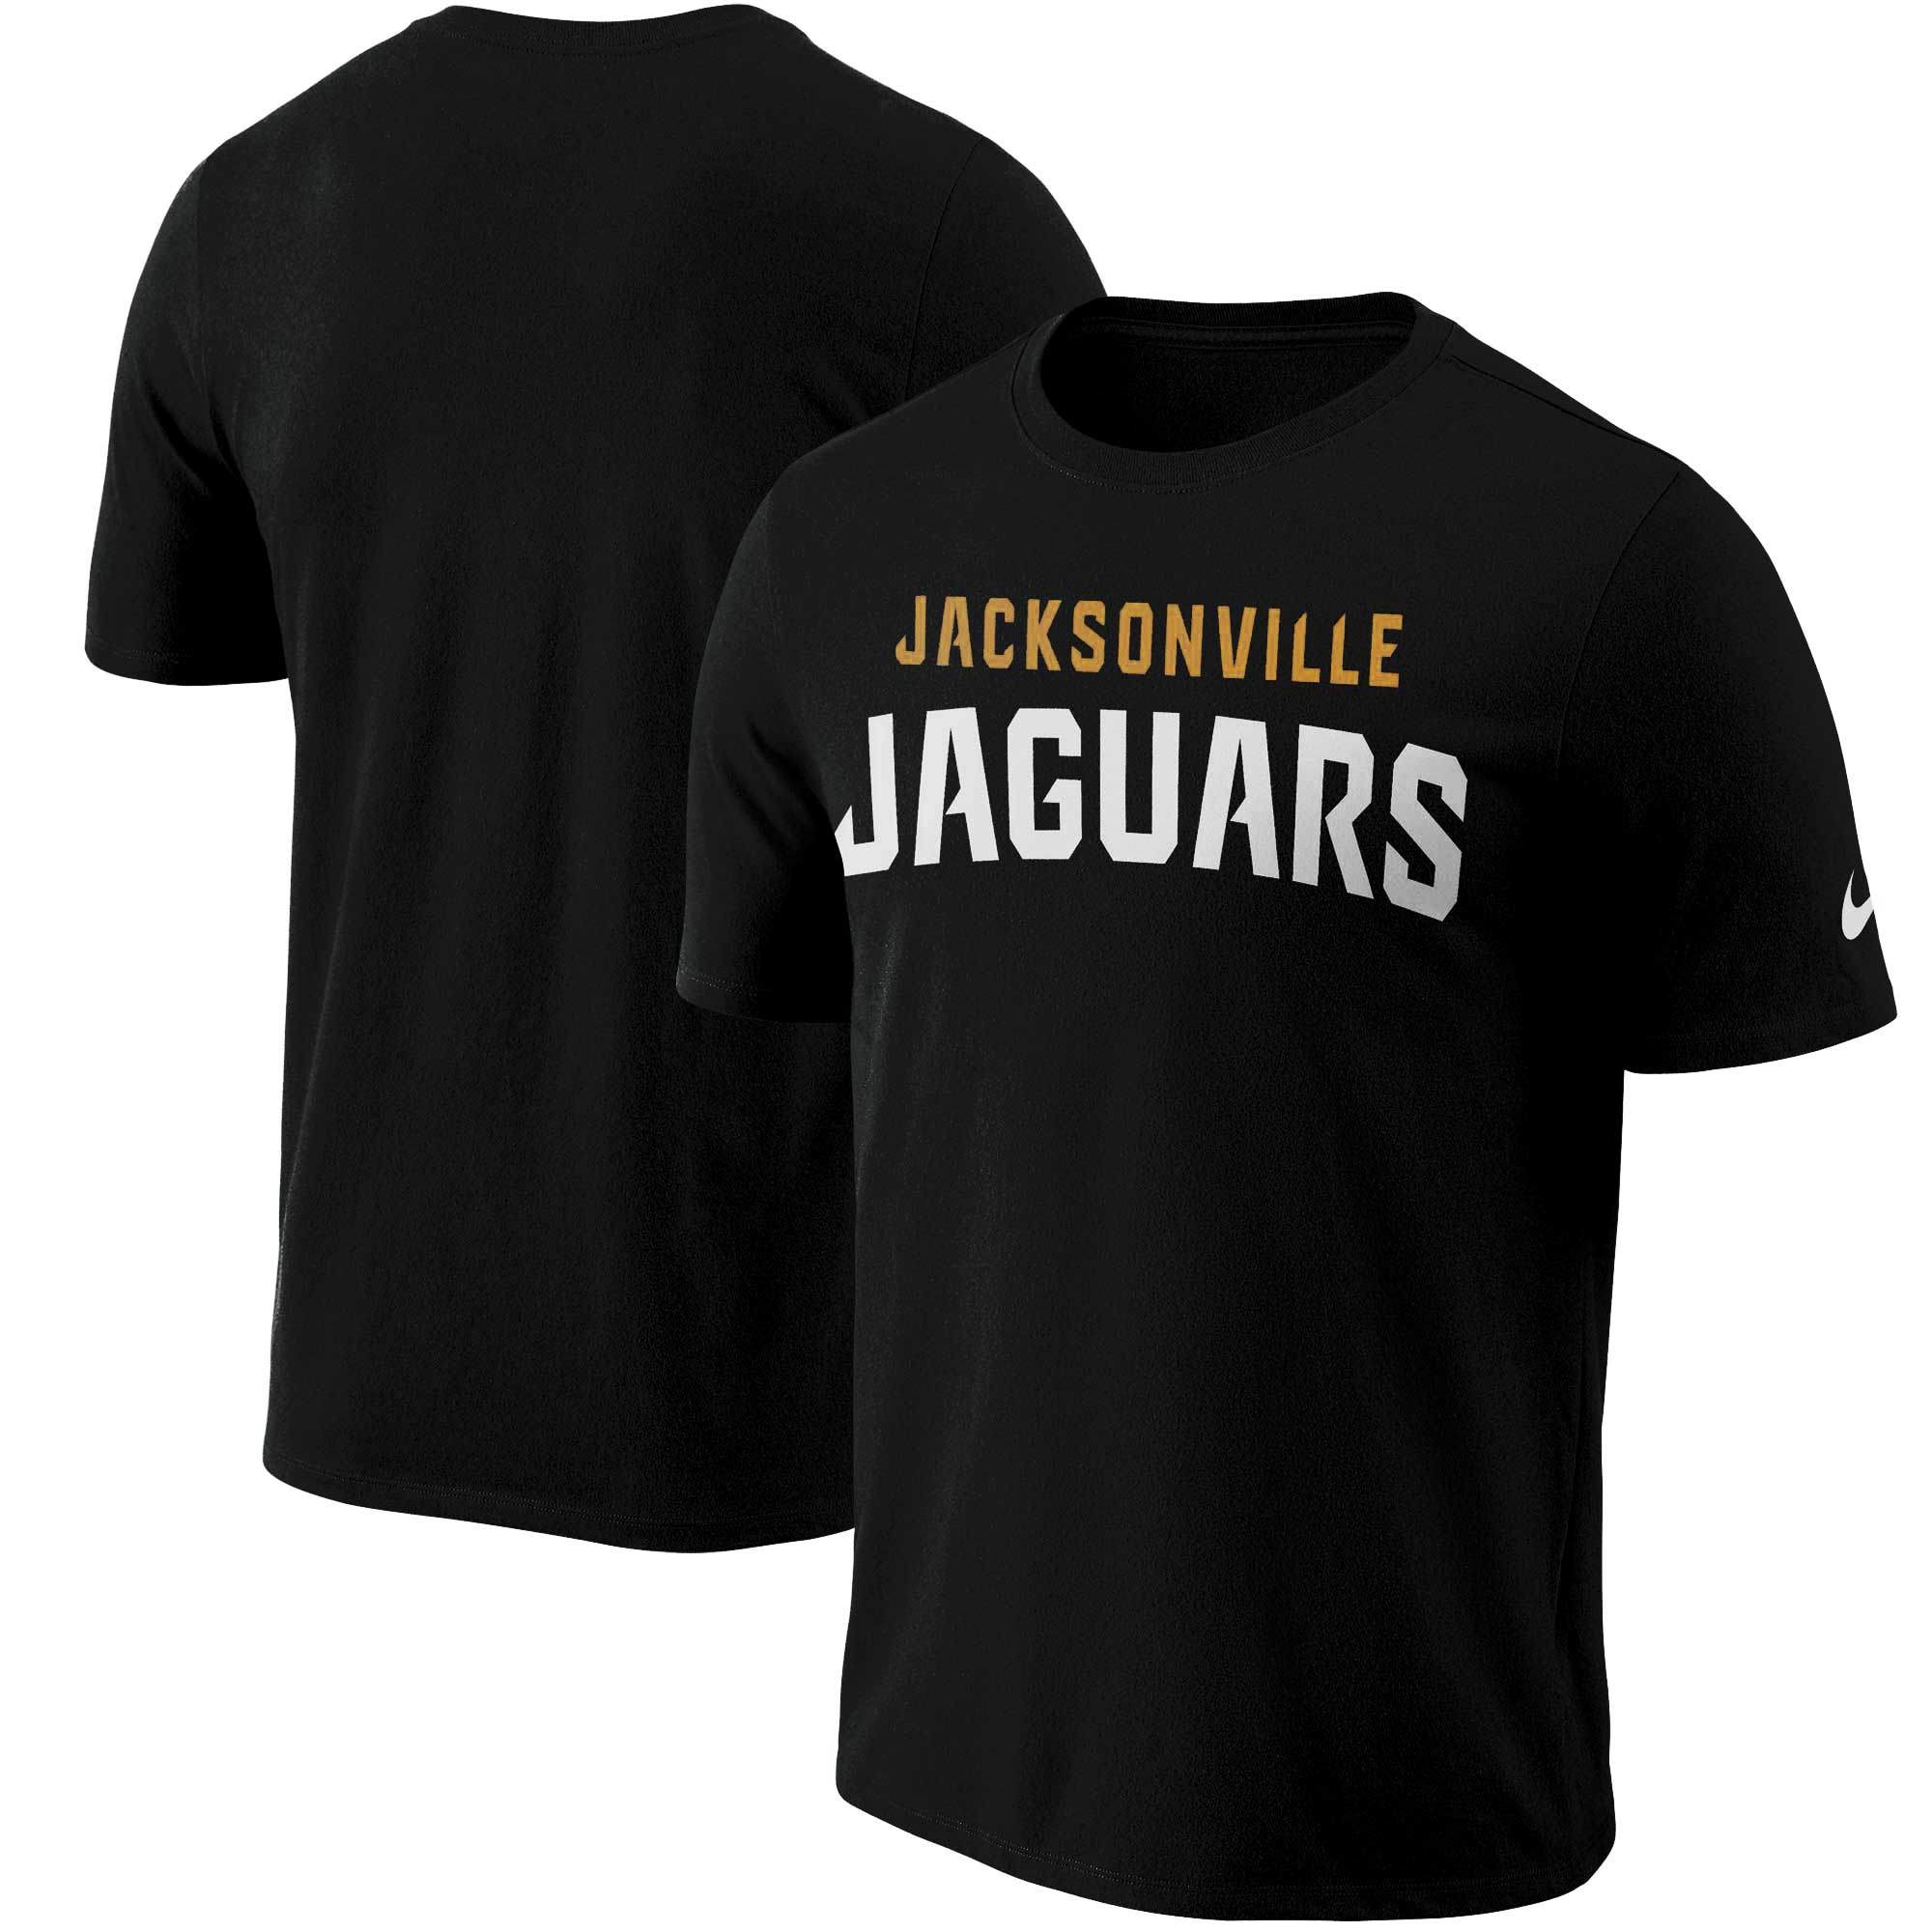 Jacksonville Jaguars Nike Dri-FIT Cotton Essential Wordmark T-Shirt - Black